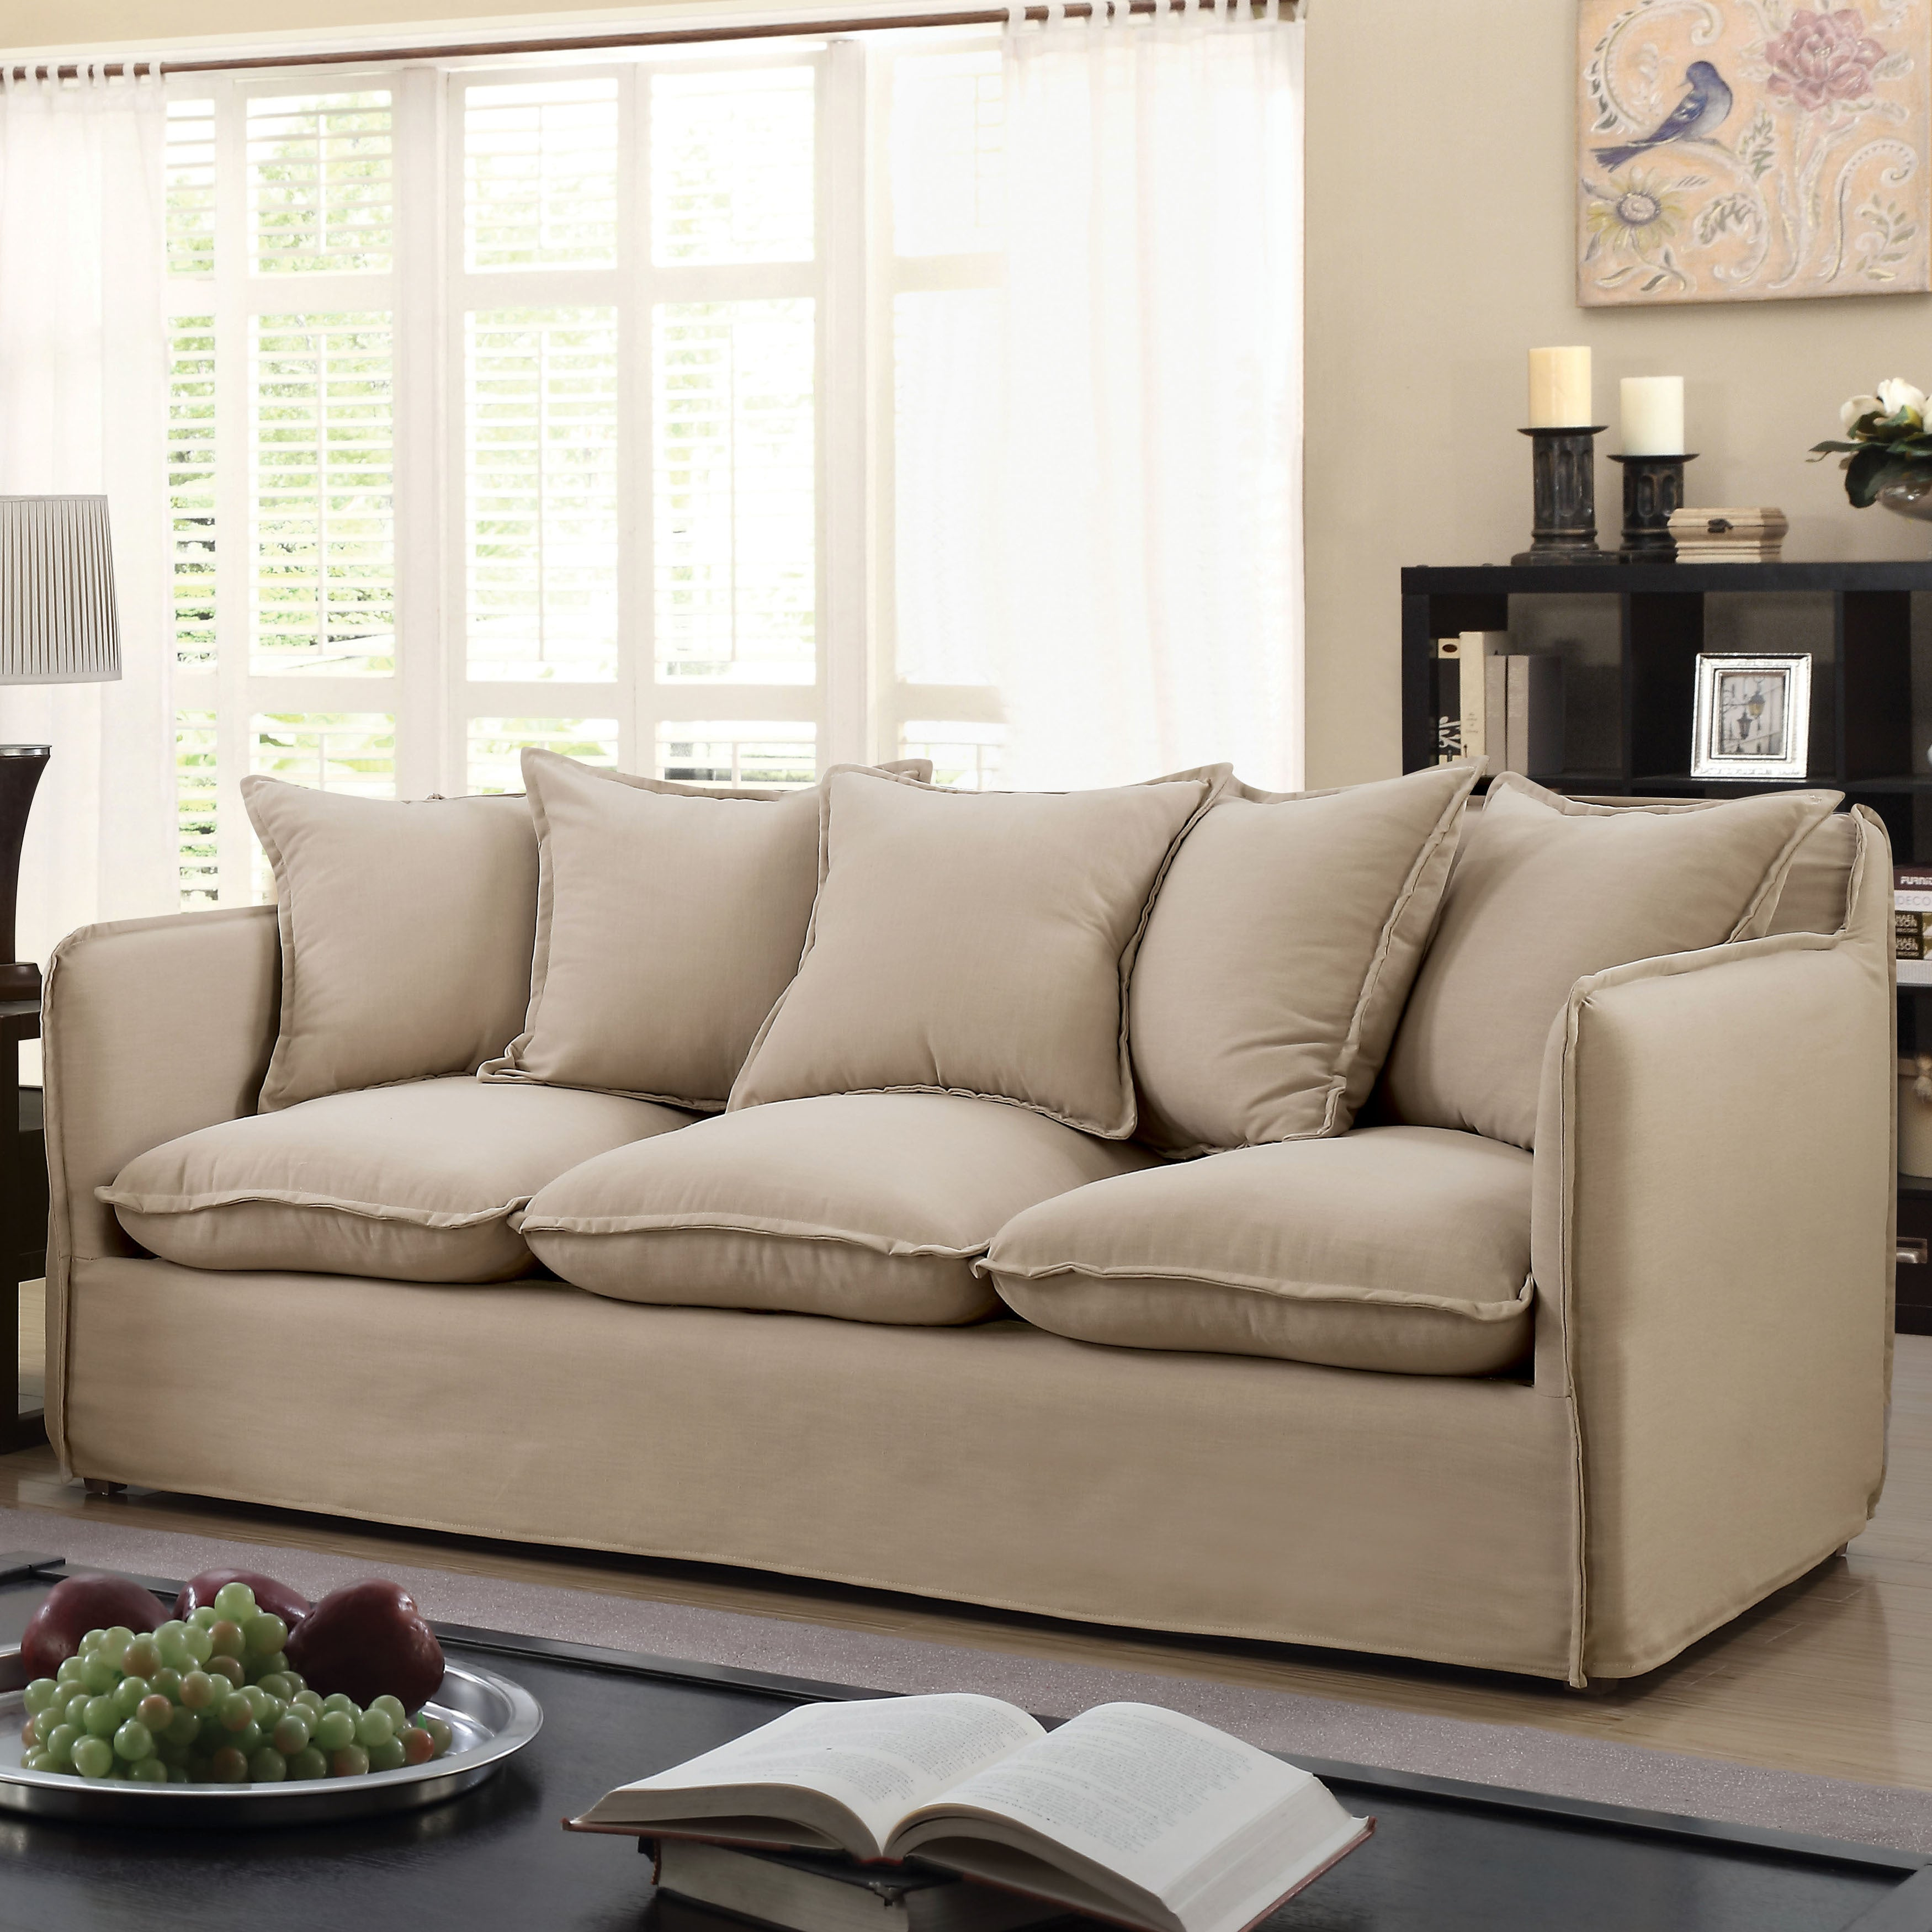 Furniture Of America Rass Boho Shabby Chic Linen Fabric Sofa